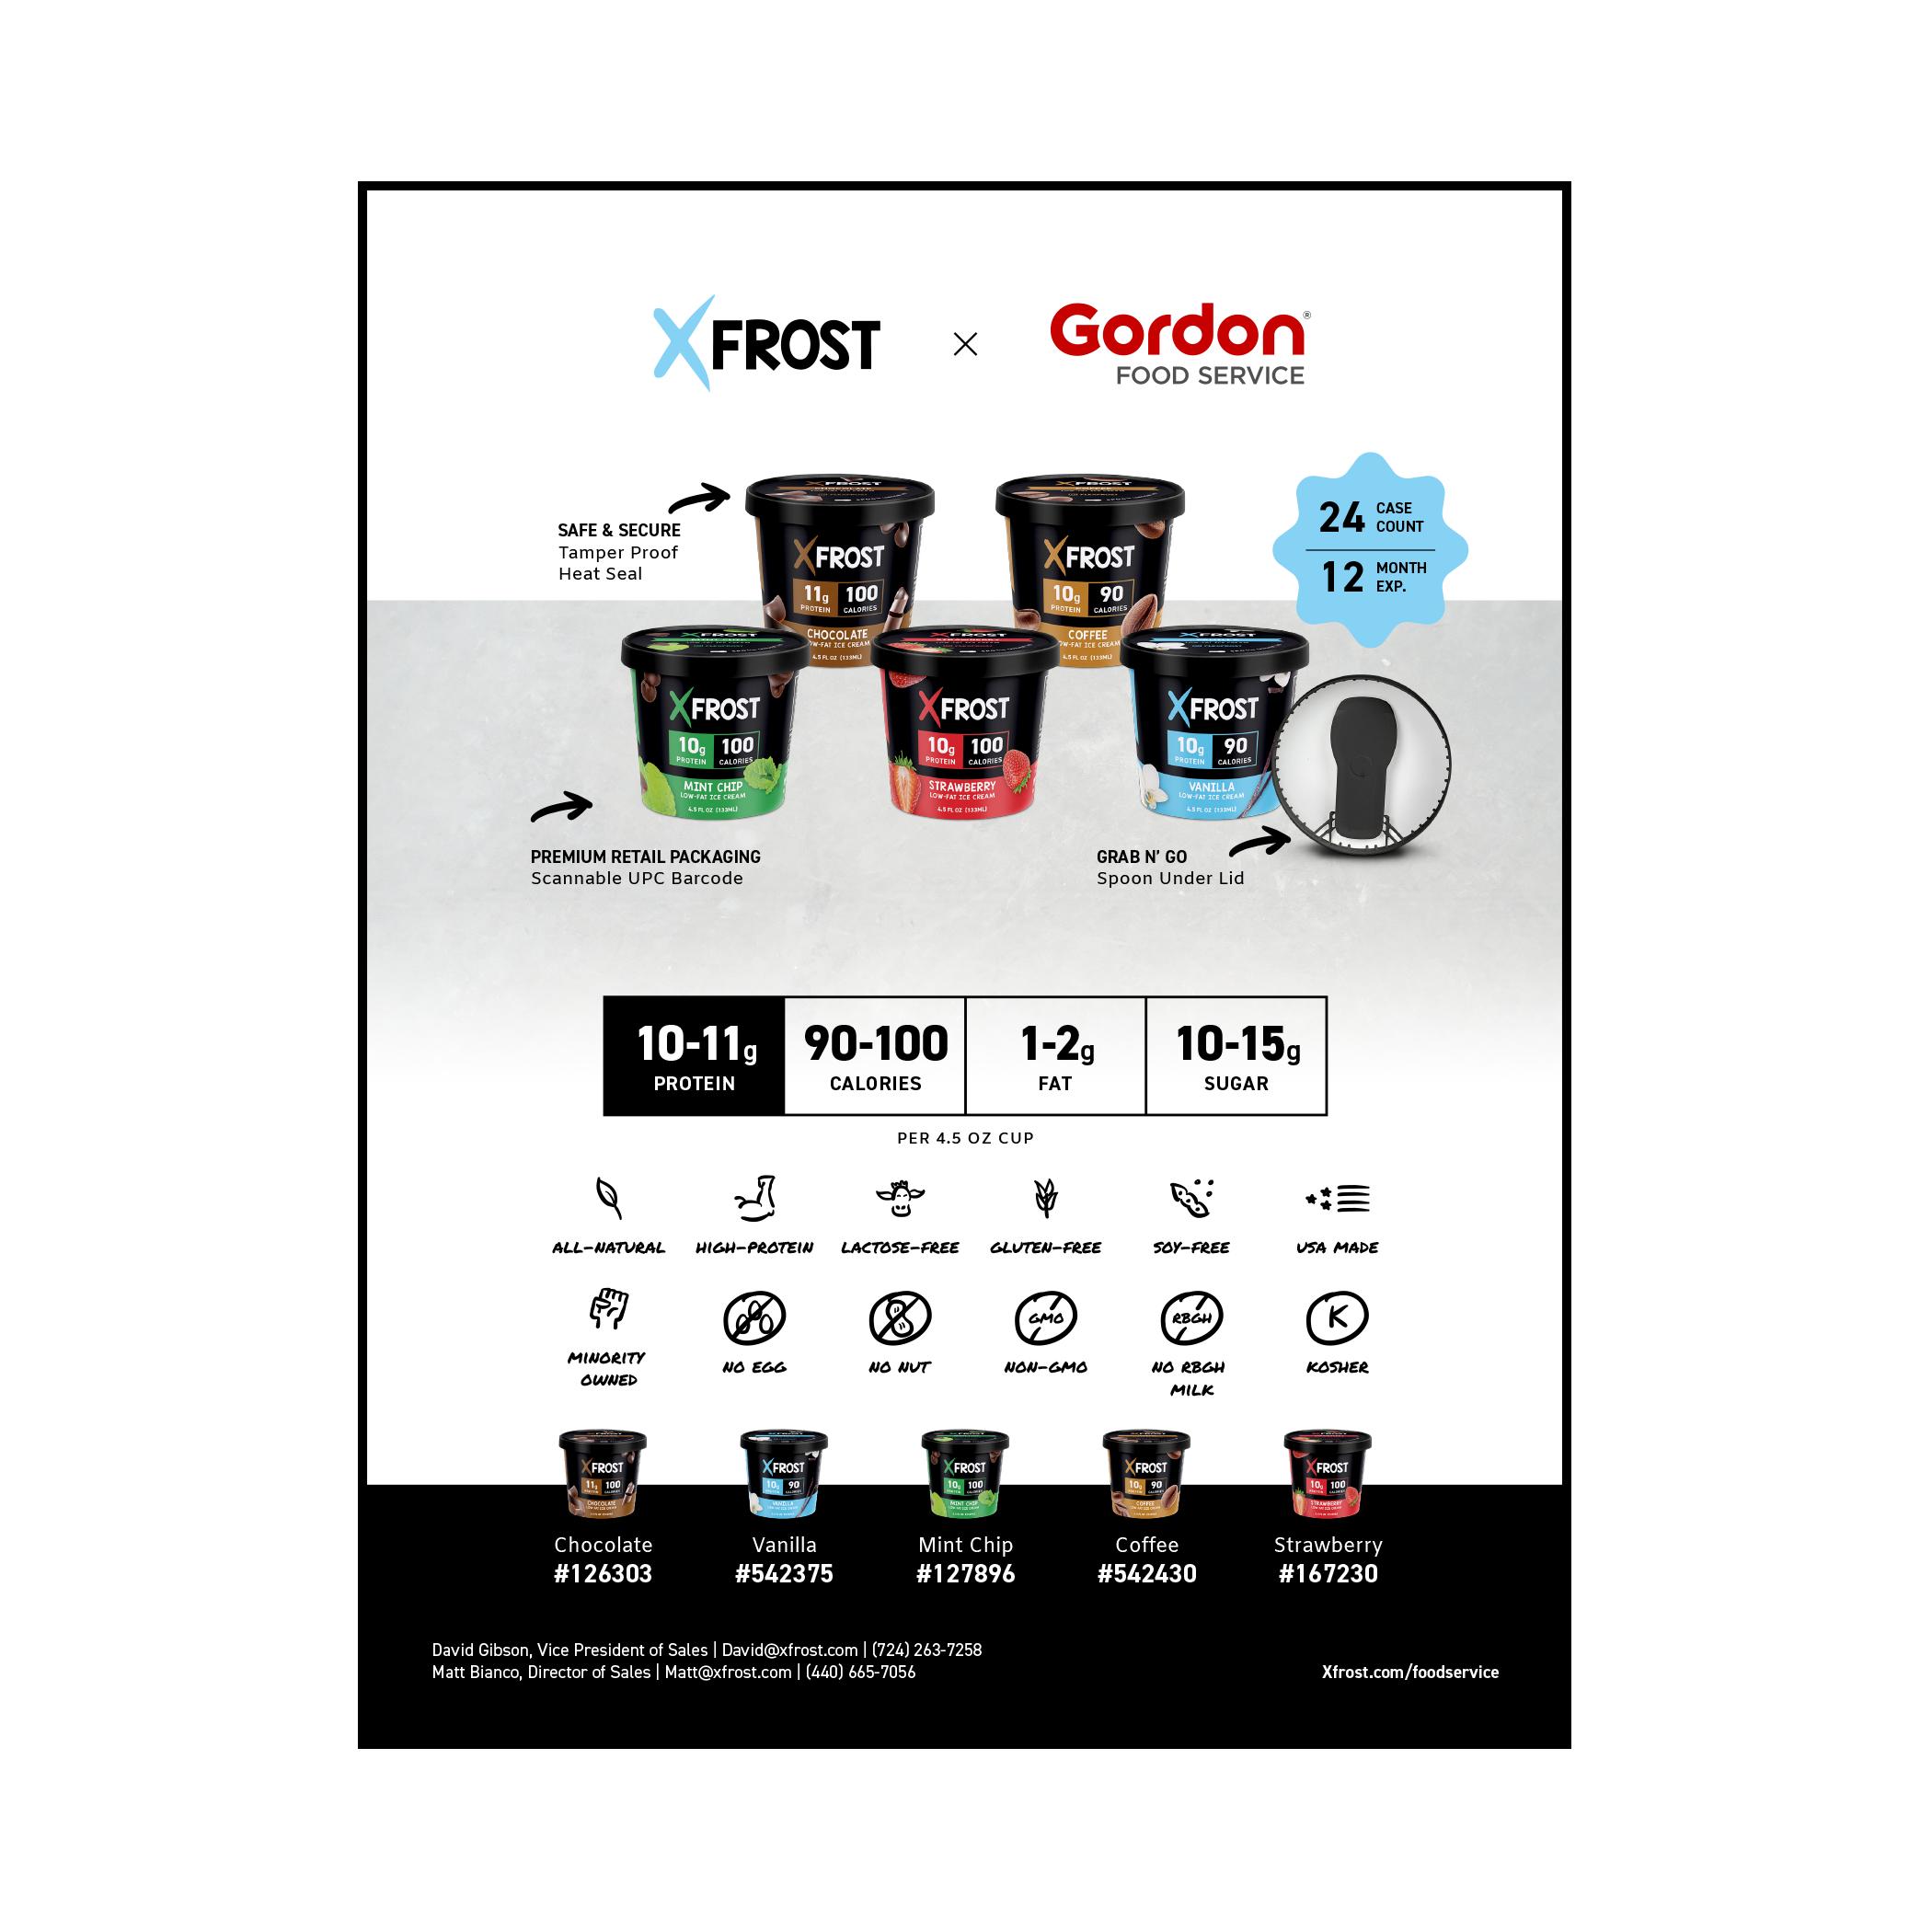 GFS Xfrost Point of Sale PDF Thumbnail Image